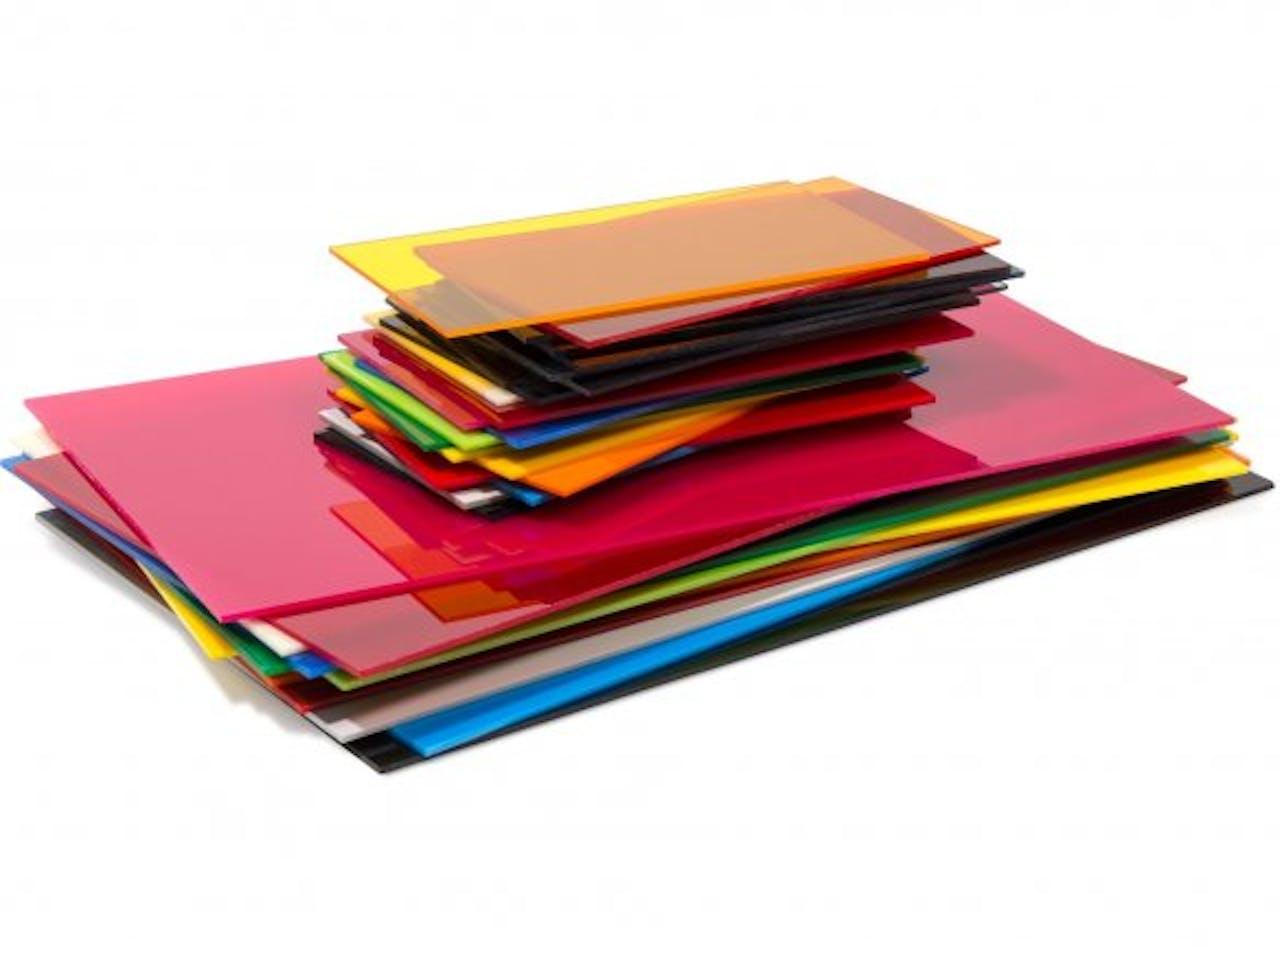 PLEXIGLAS® GS farbig, 3 mm, 3,0 x 250 x 500 mm, gelb, opak (1H01)